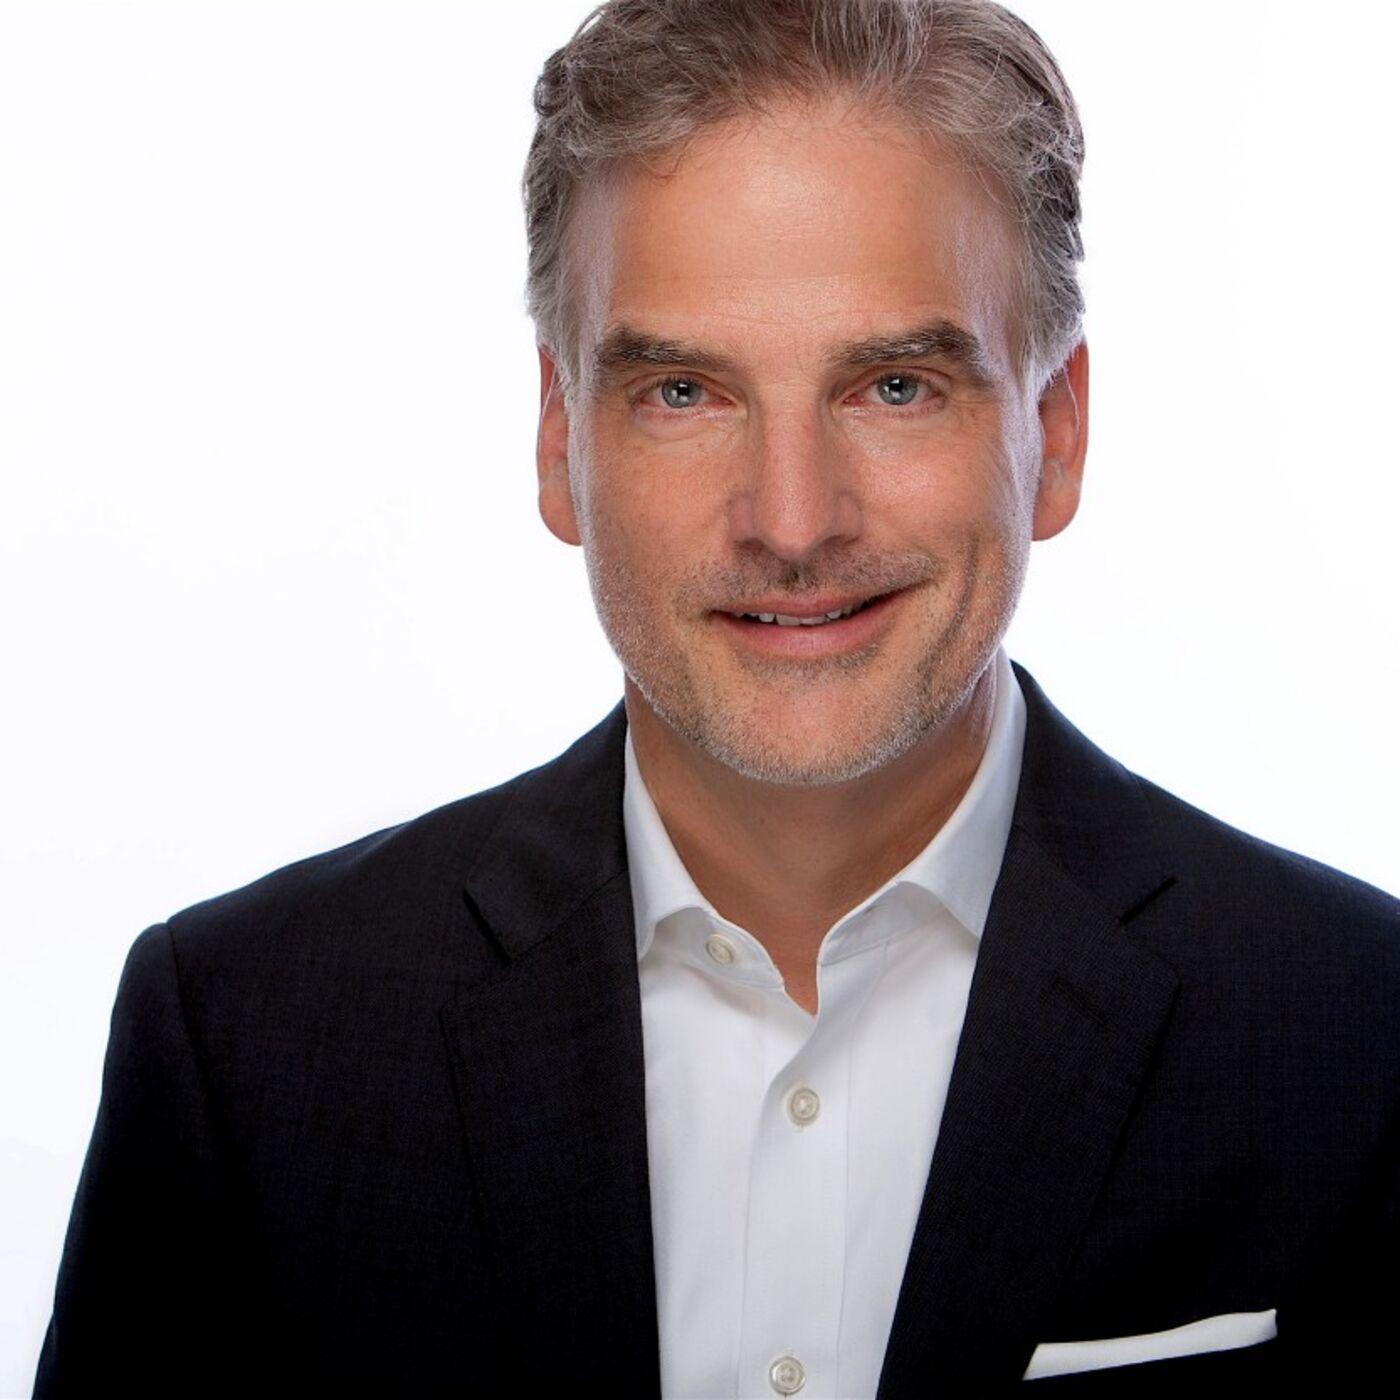 Joseph Meuse of Business GPS